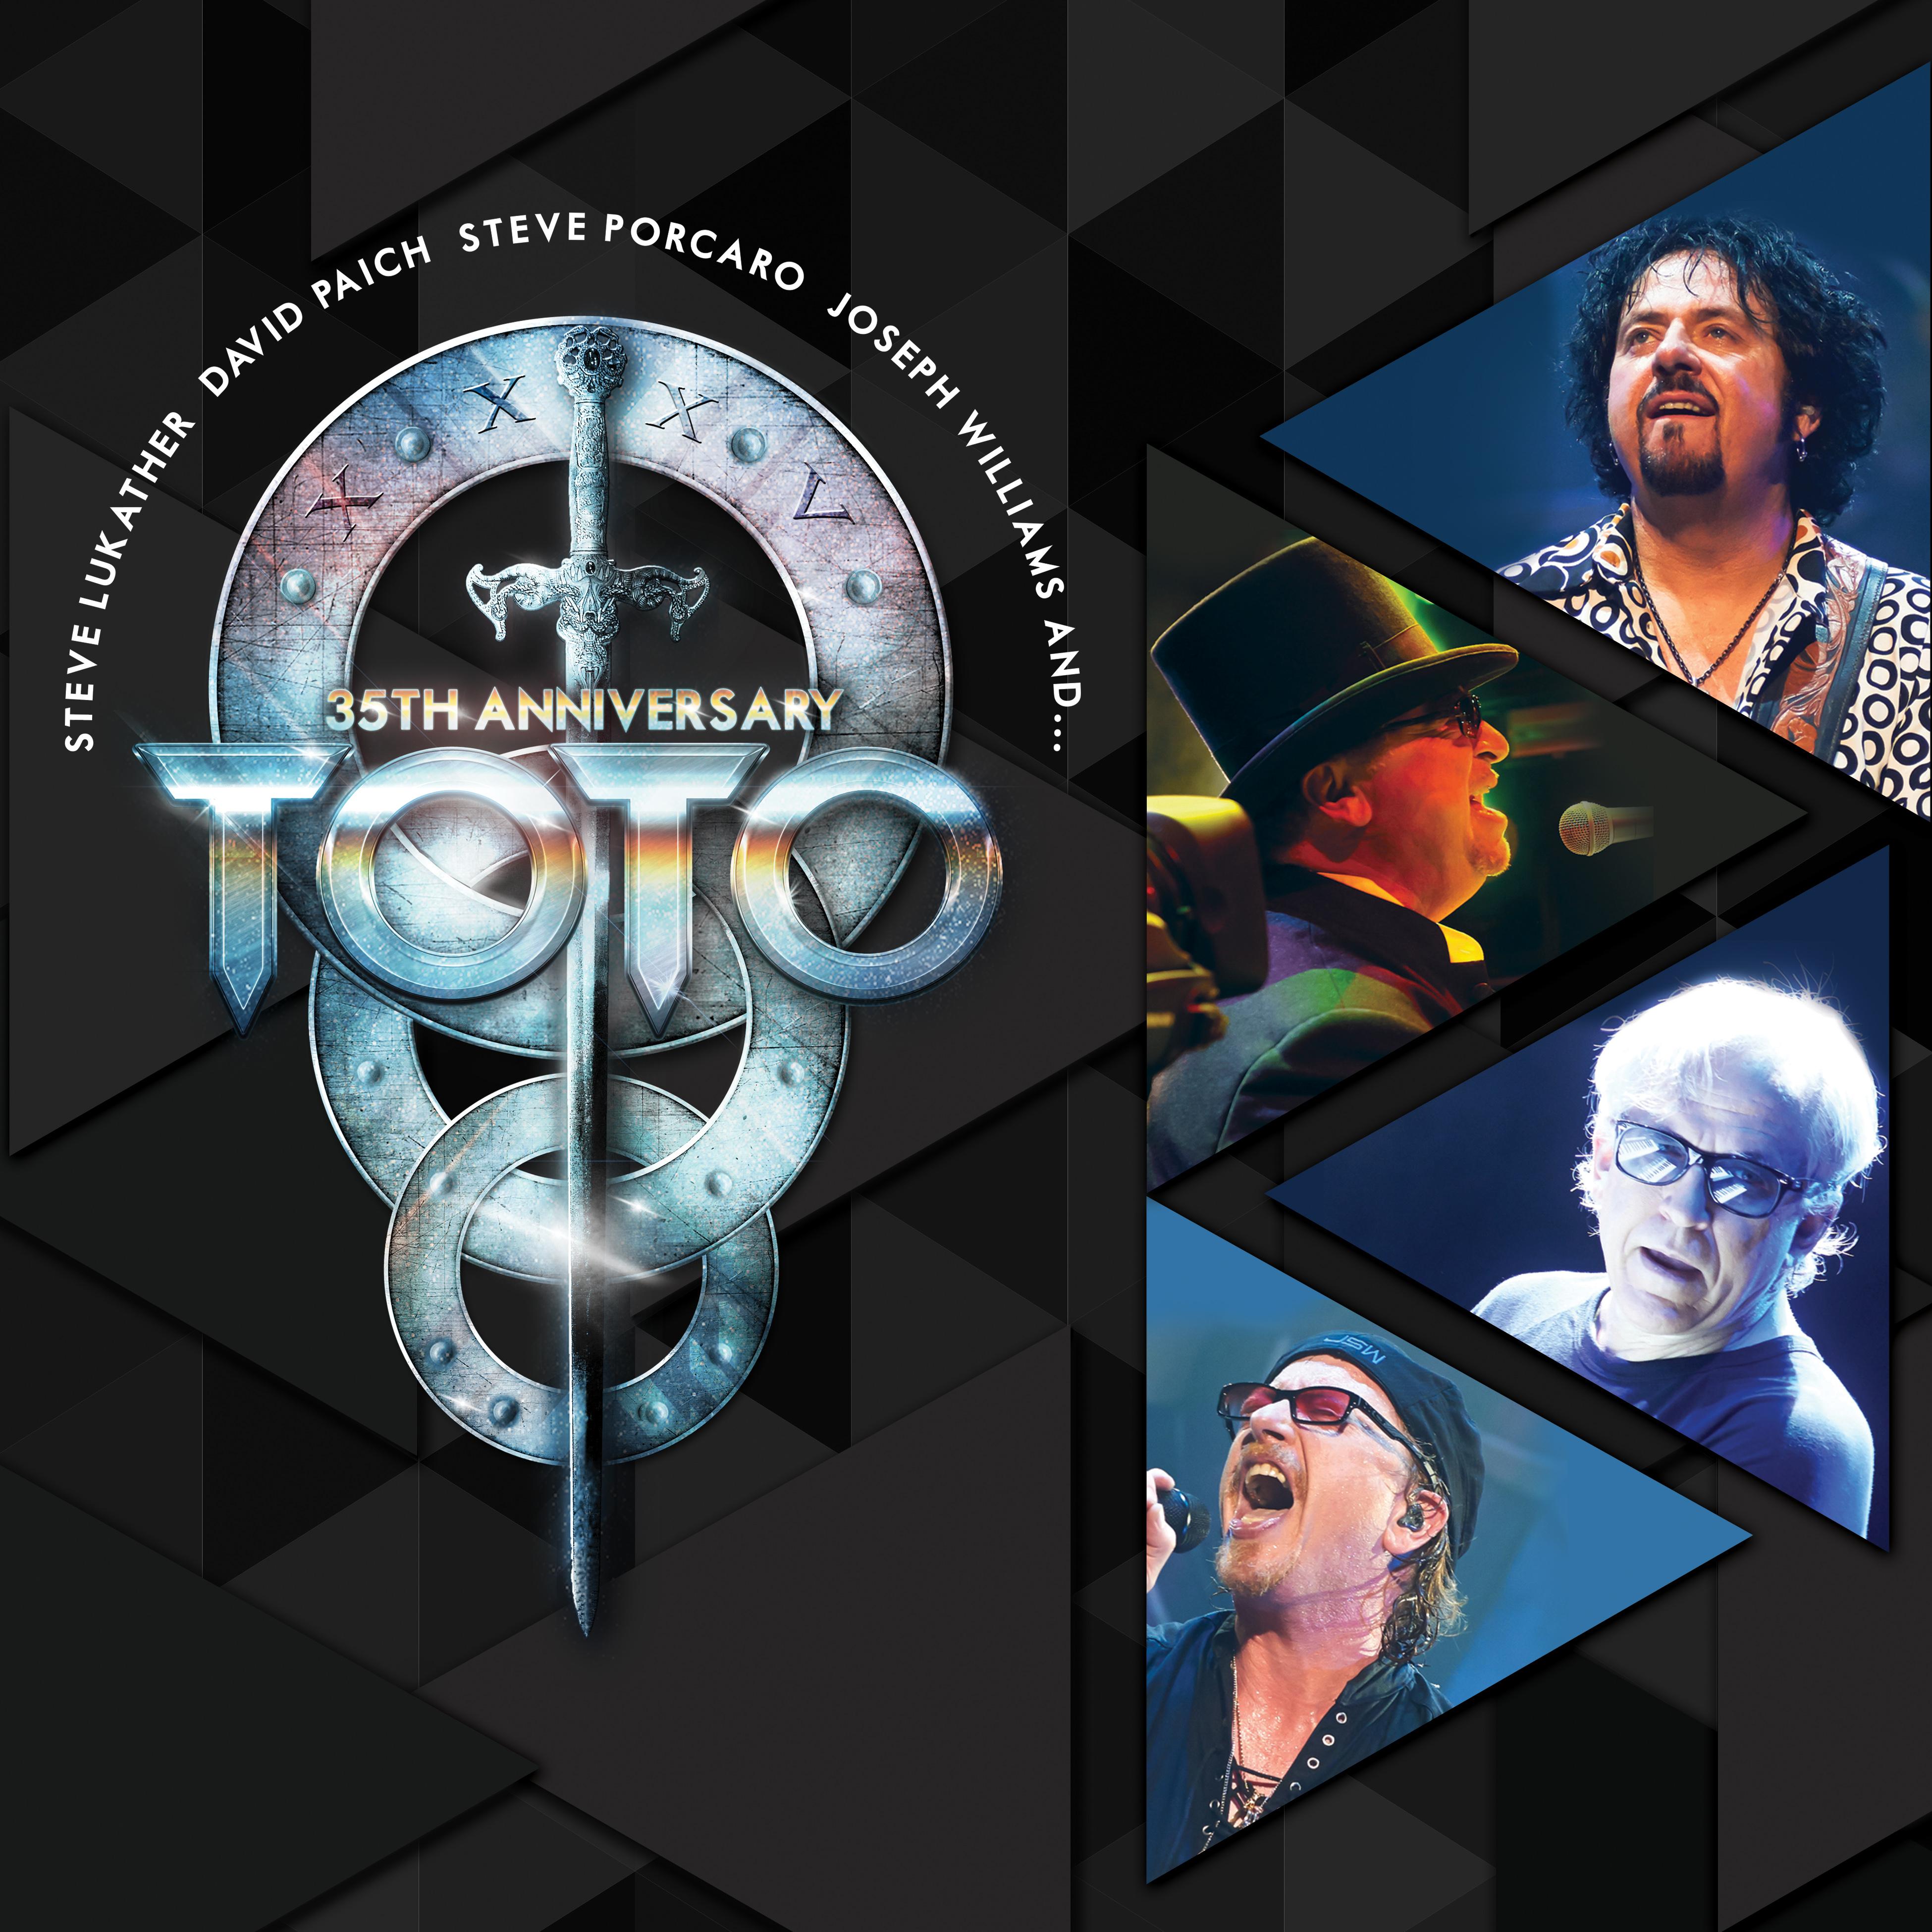 Toto Band Photo 1